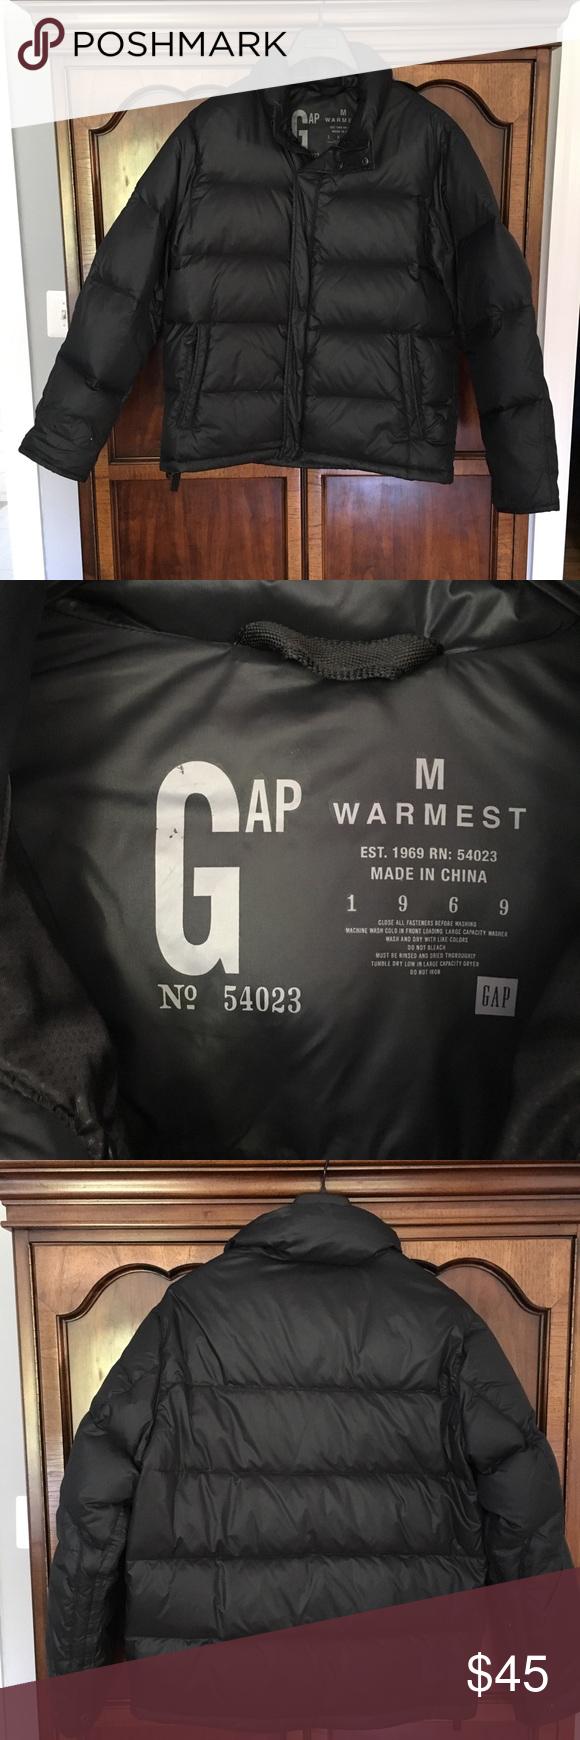 Nwot Gap Down Feather Puffer Jacket Jackets Puffer Jackets Gap Jacket [ 1740 x 580 Pixel ]